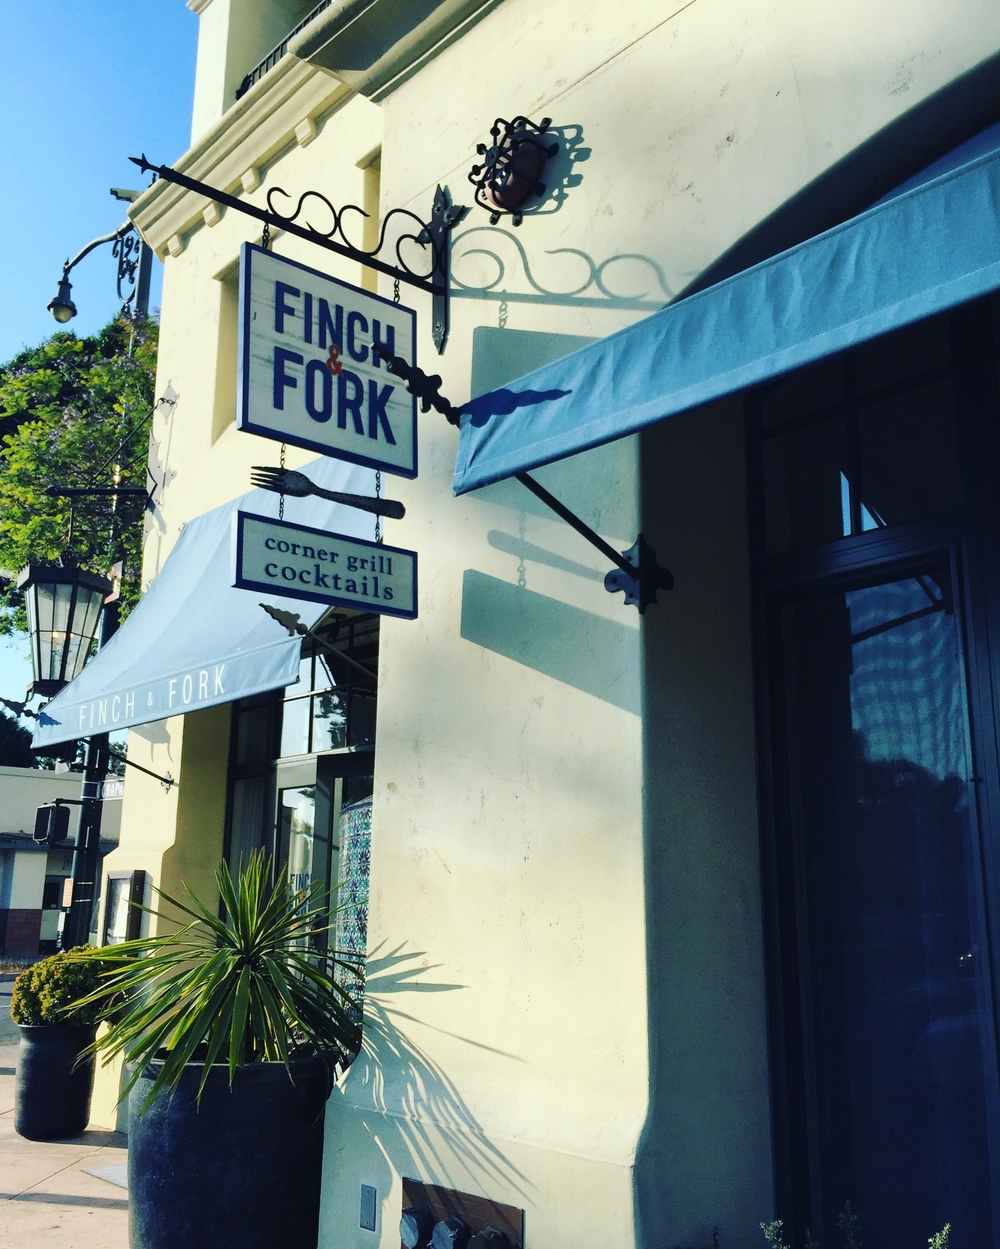 Finch & Fork (Kimpton's Canary Hotel in Santa Barbara)